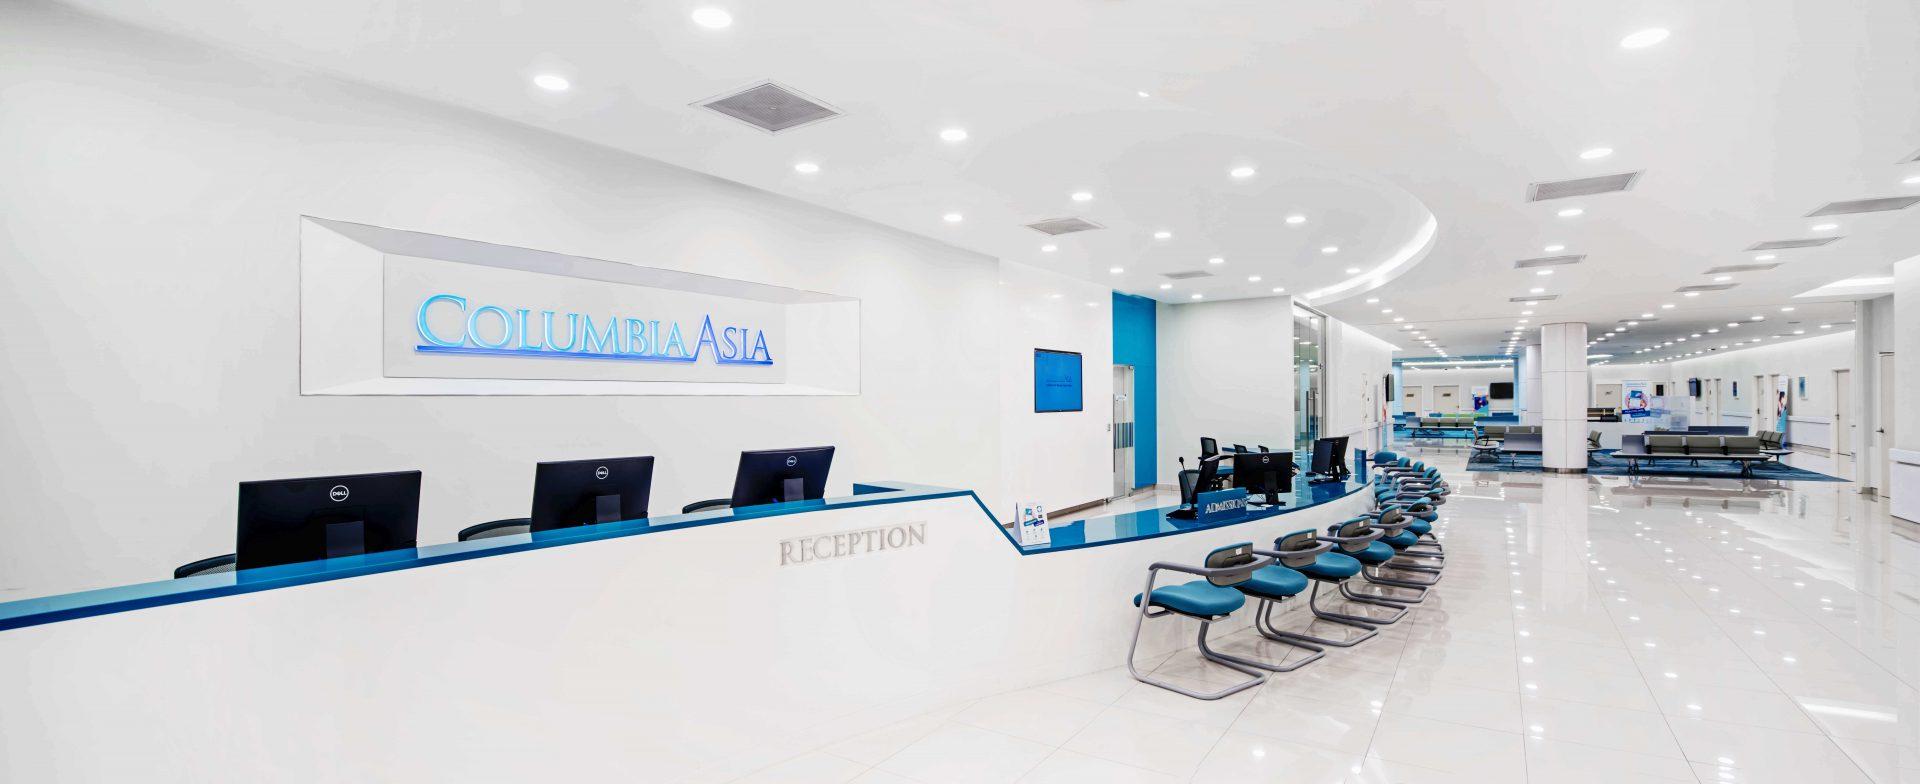 Syukur, Hospital Columbia Asia terbesar di Malaysia Telah di Tebrau 3